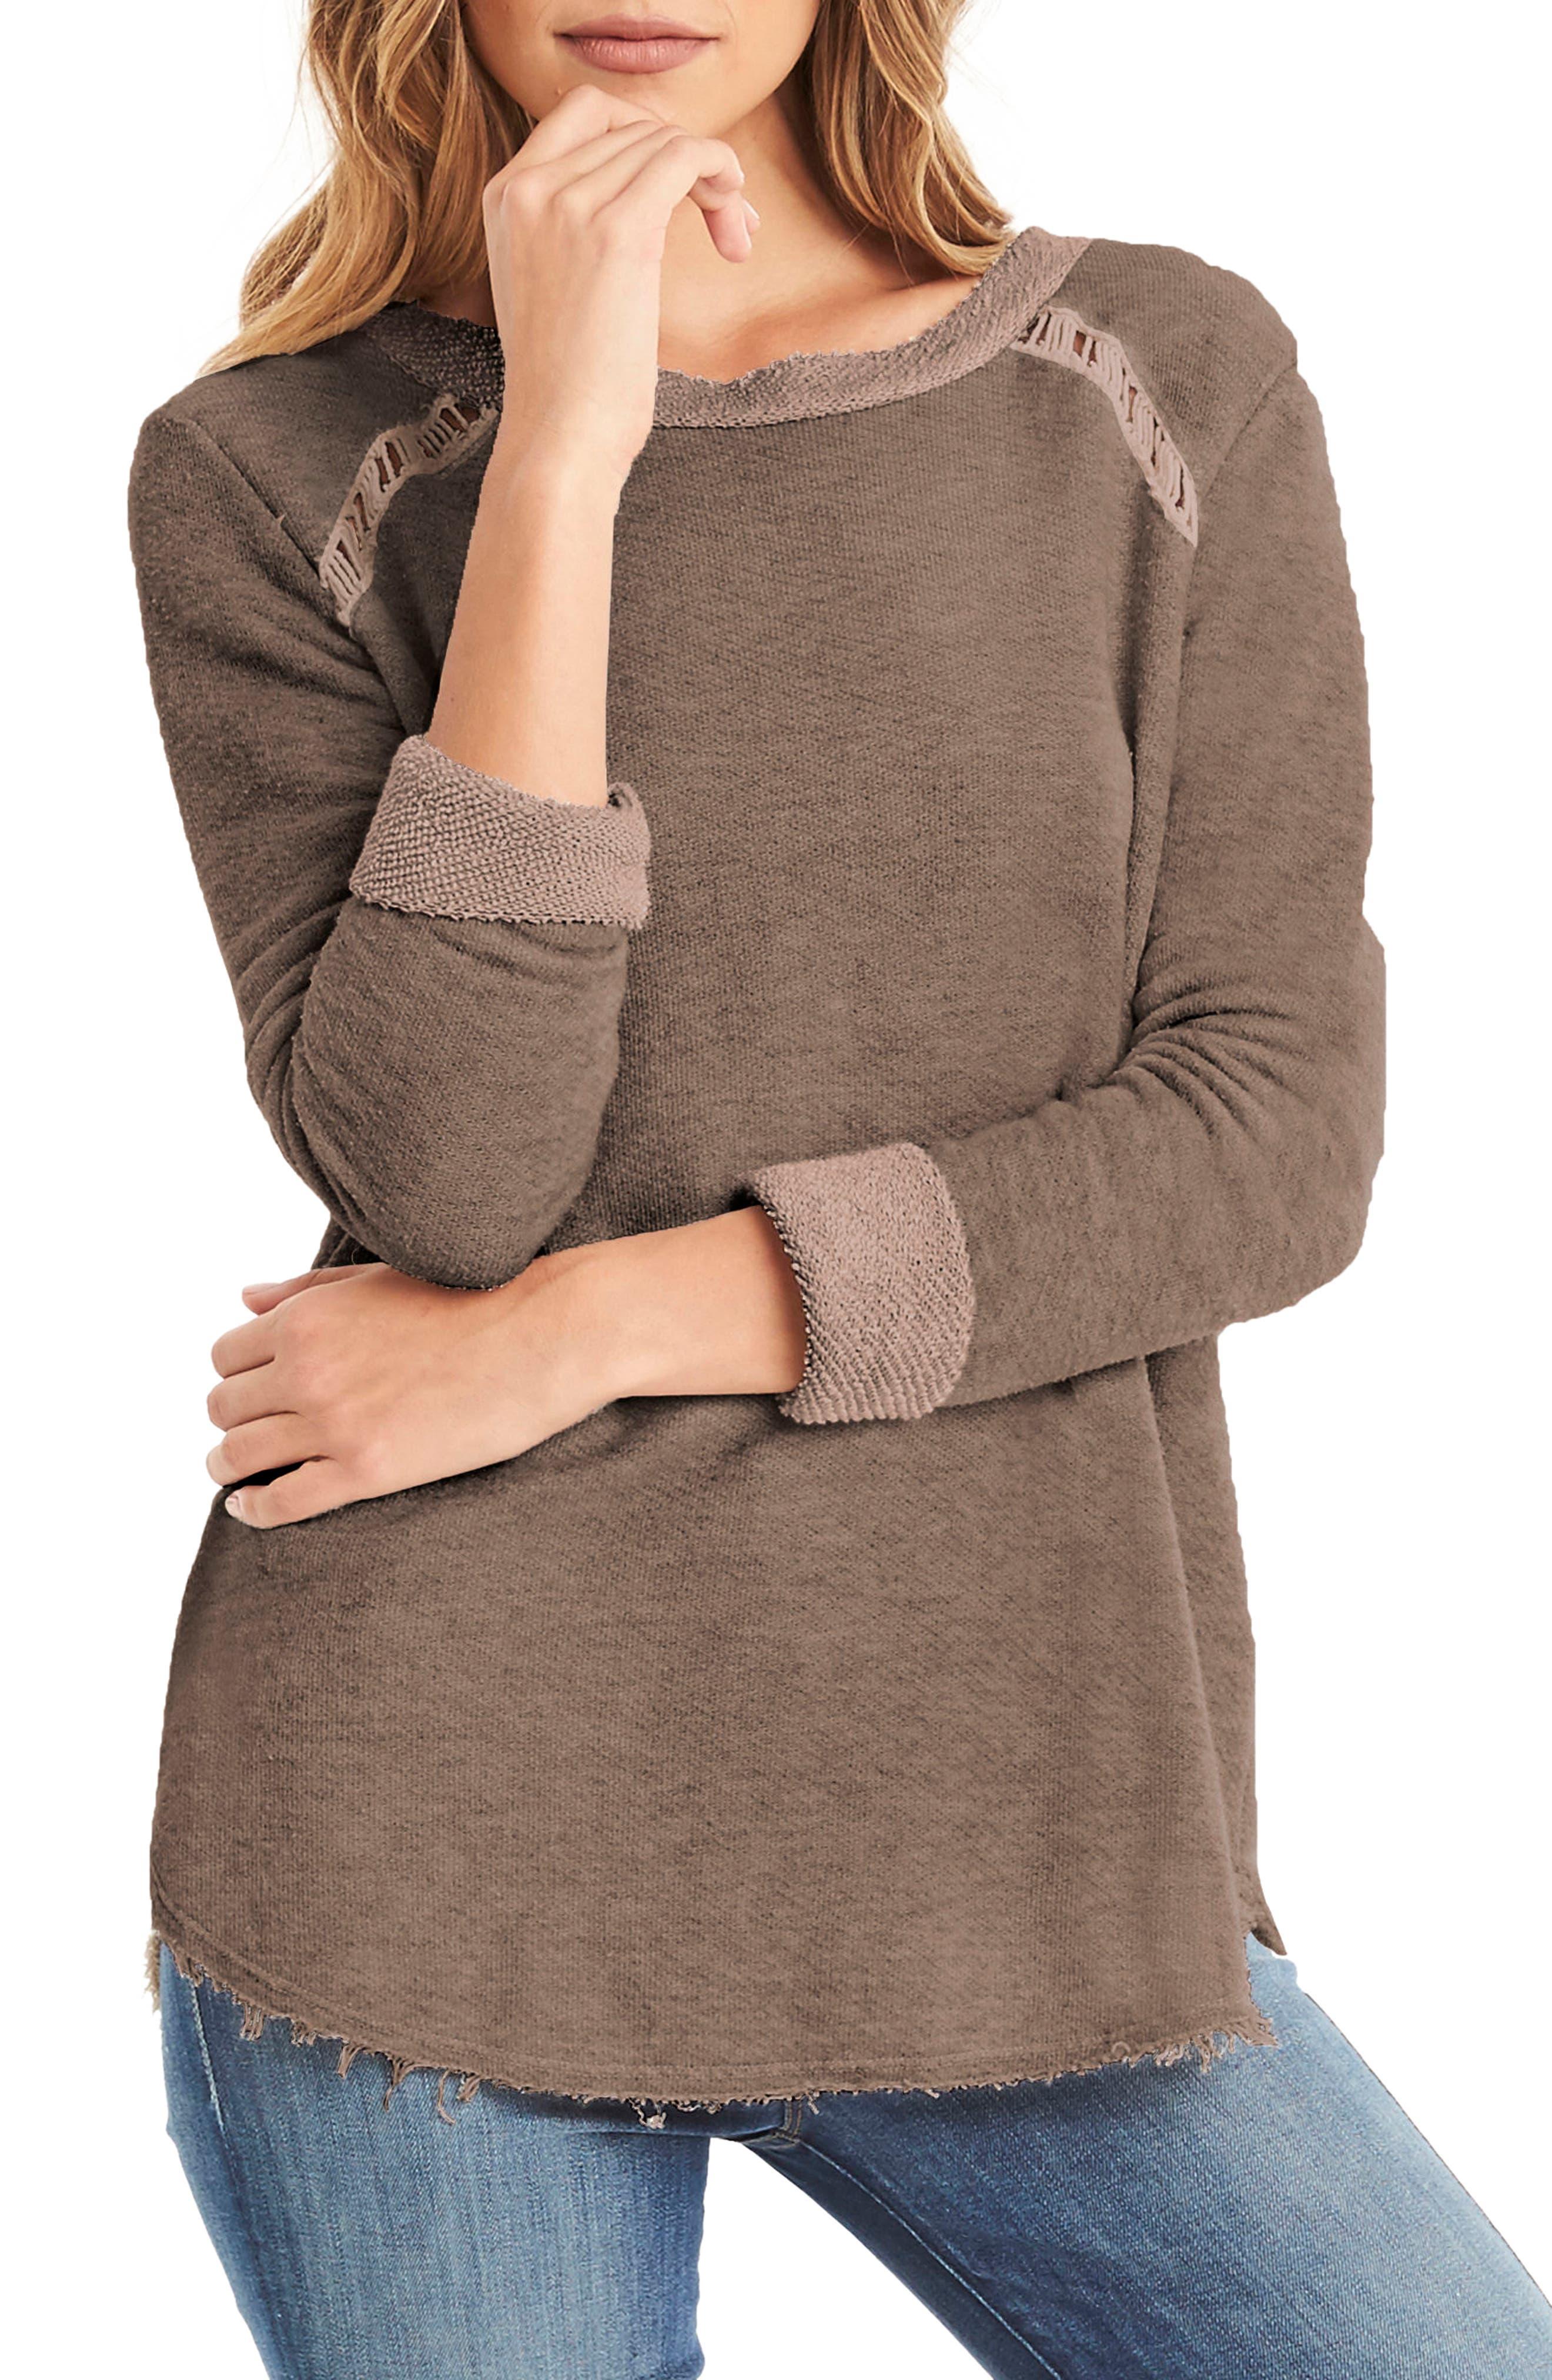 Distressed Sweatshirt,                             Main thumbnail 1, color,                             250